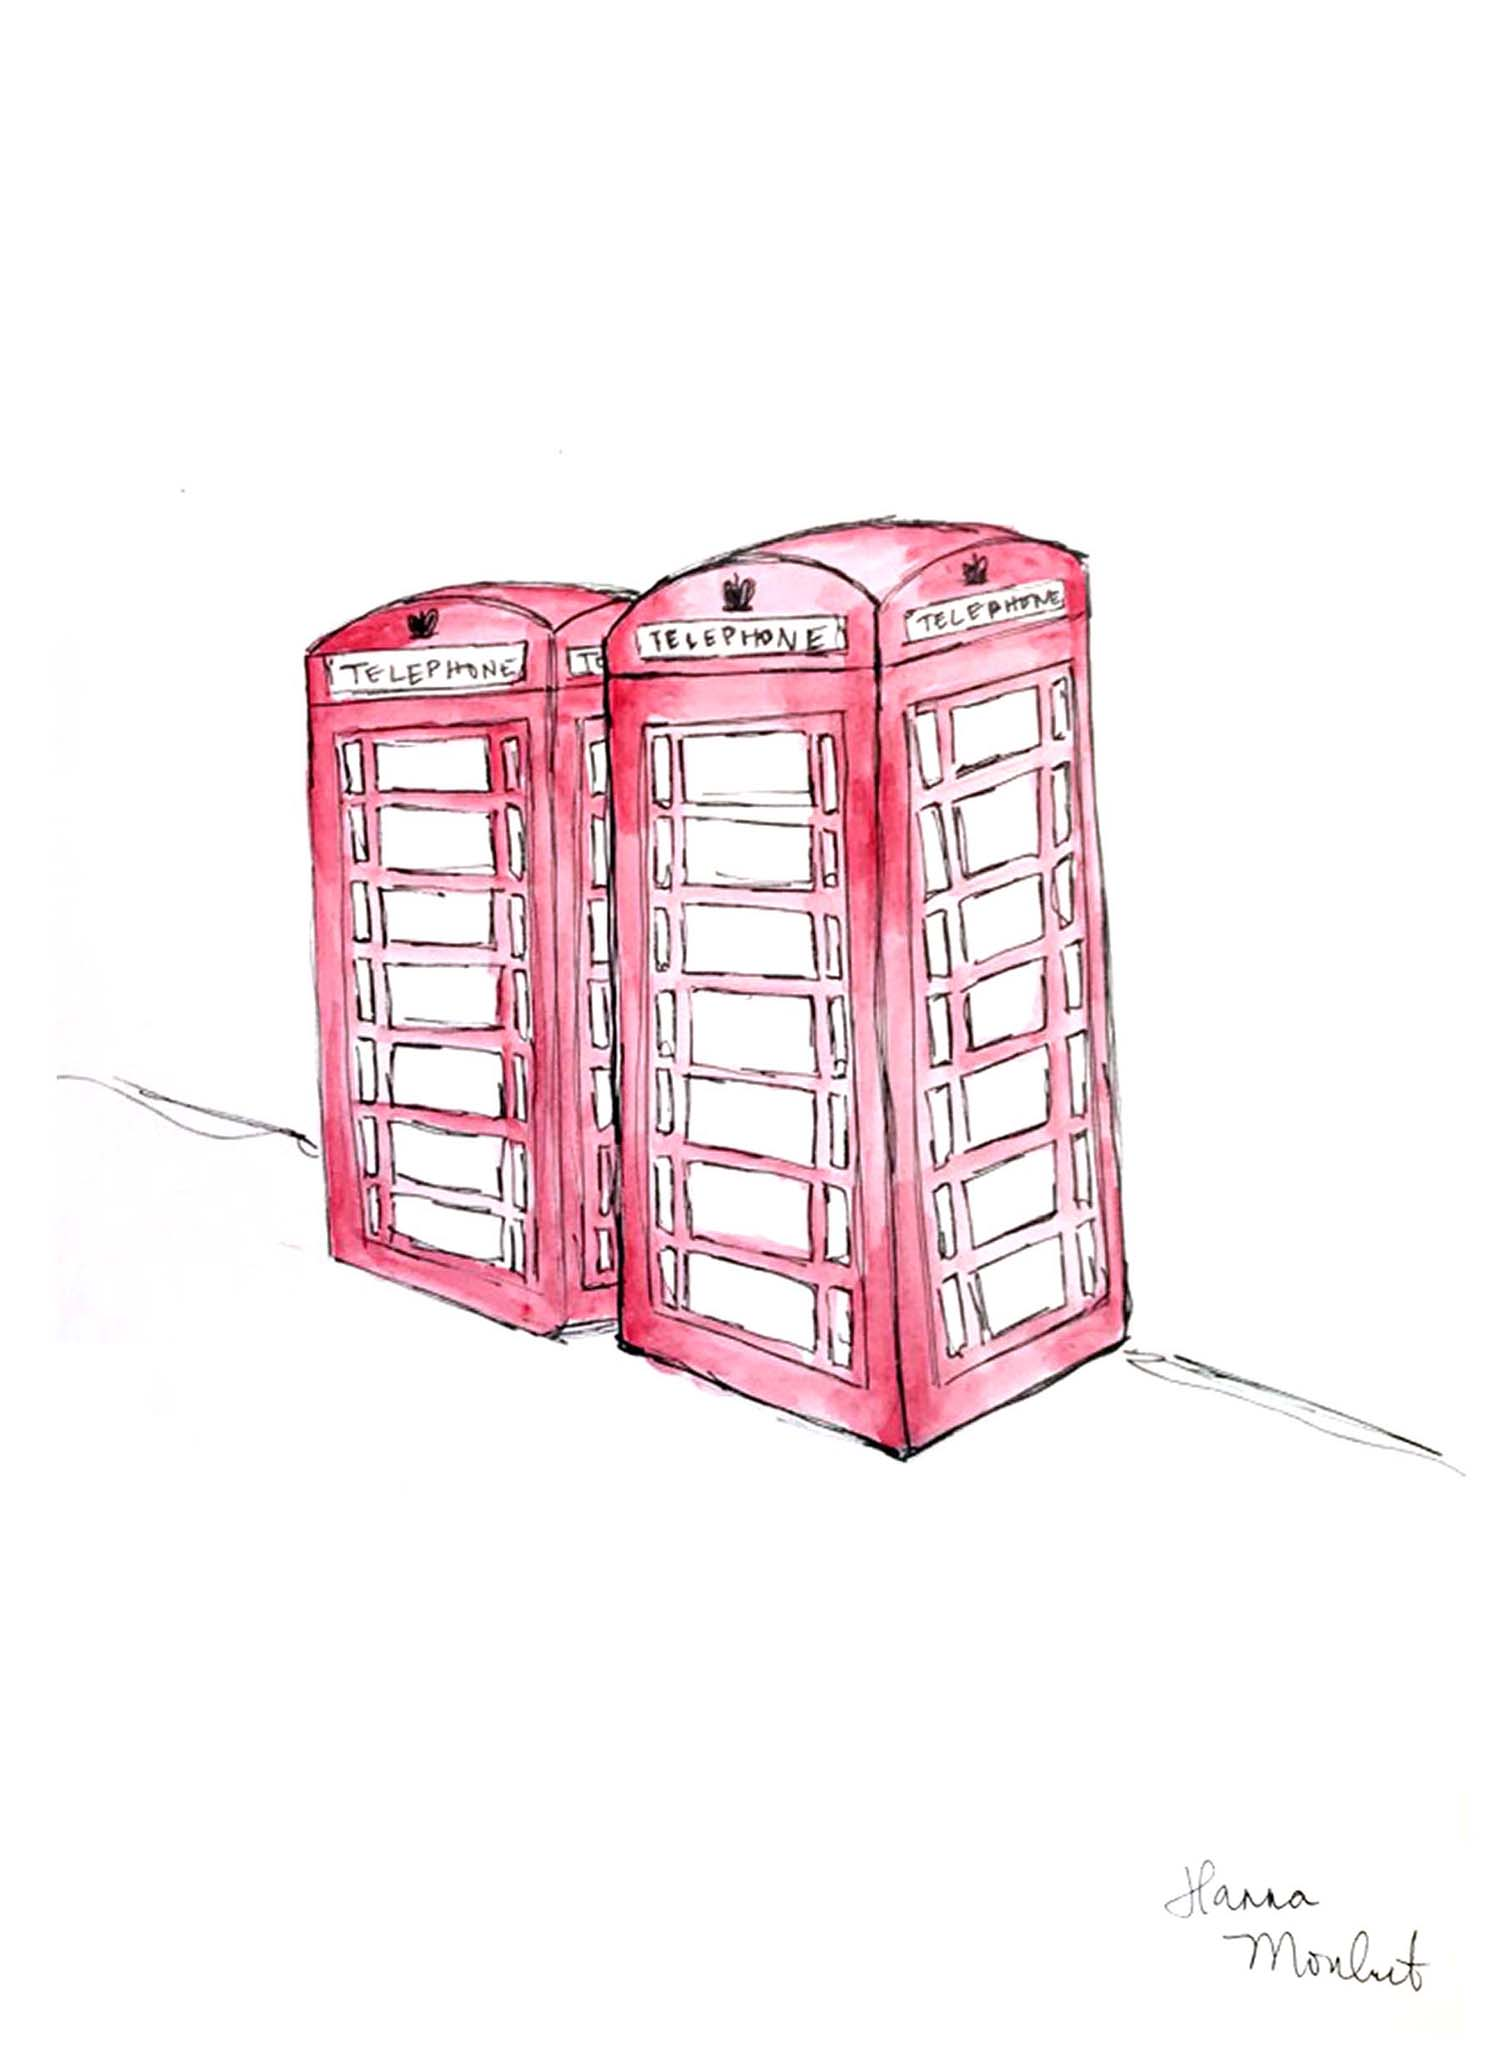 5-Moulenbelt-Telephone_Booth-1500x2048